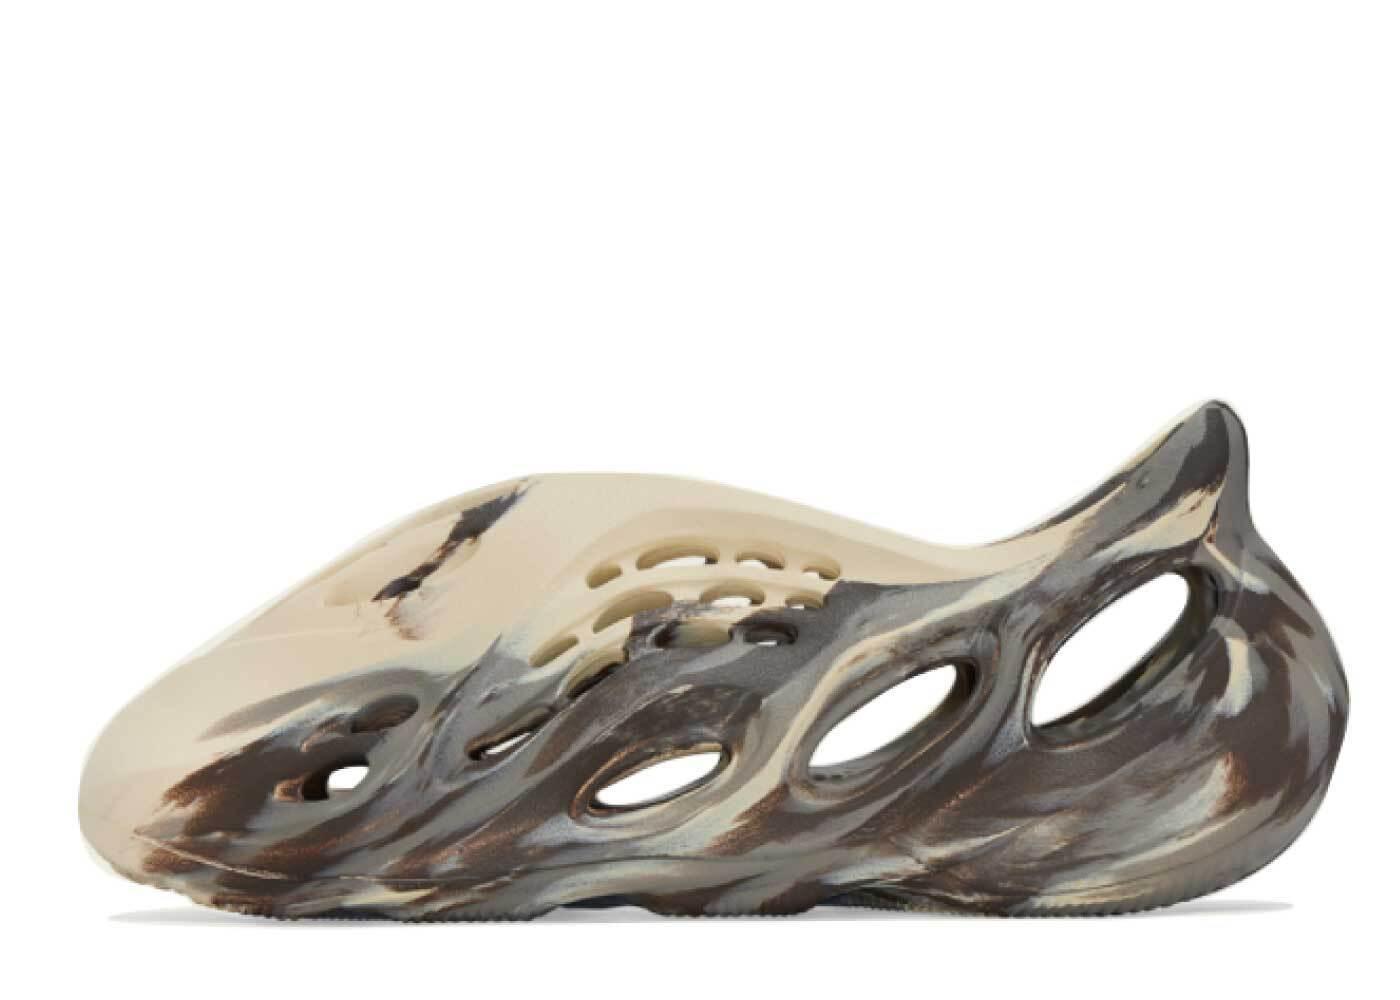 adidas Yeezy Foam Runner MX Cream Clayの写真